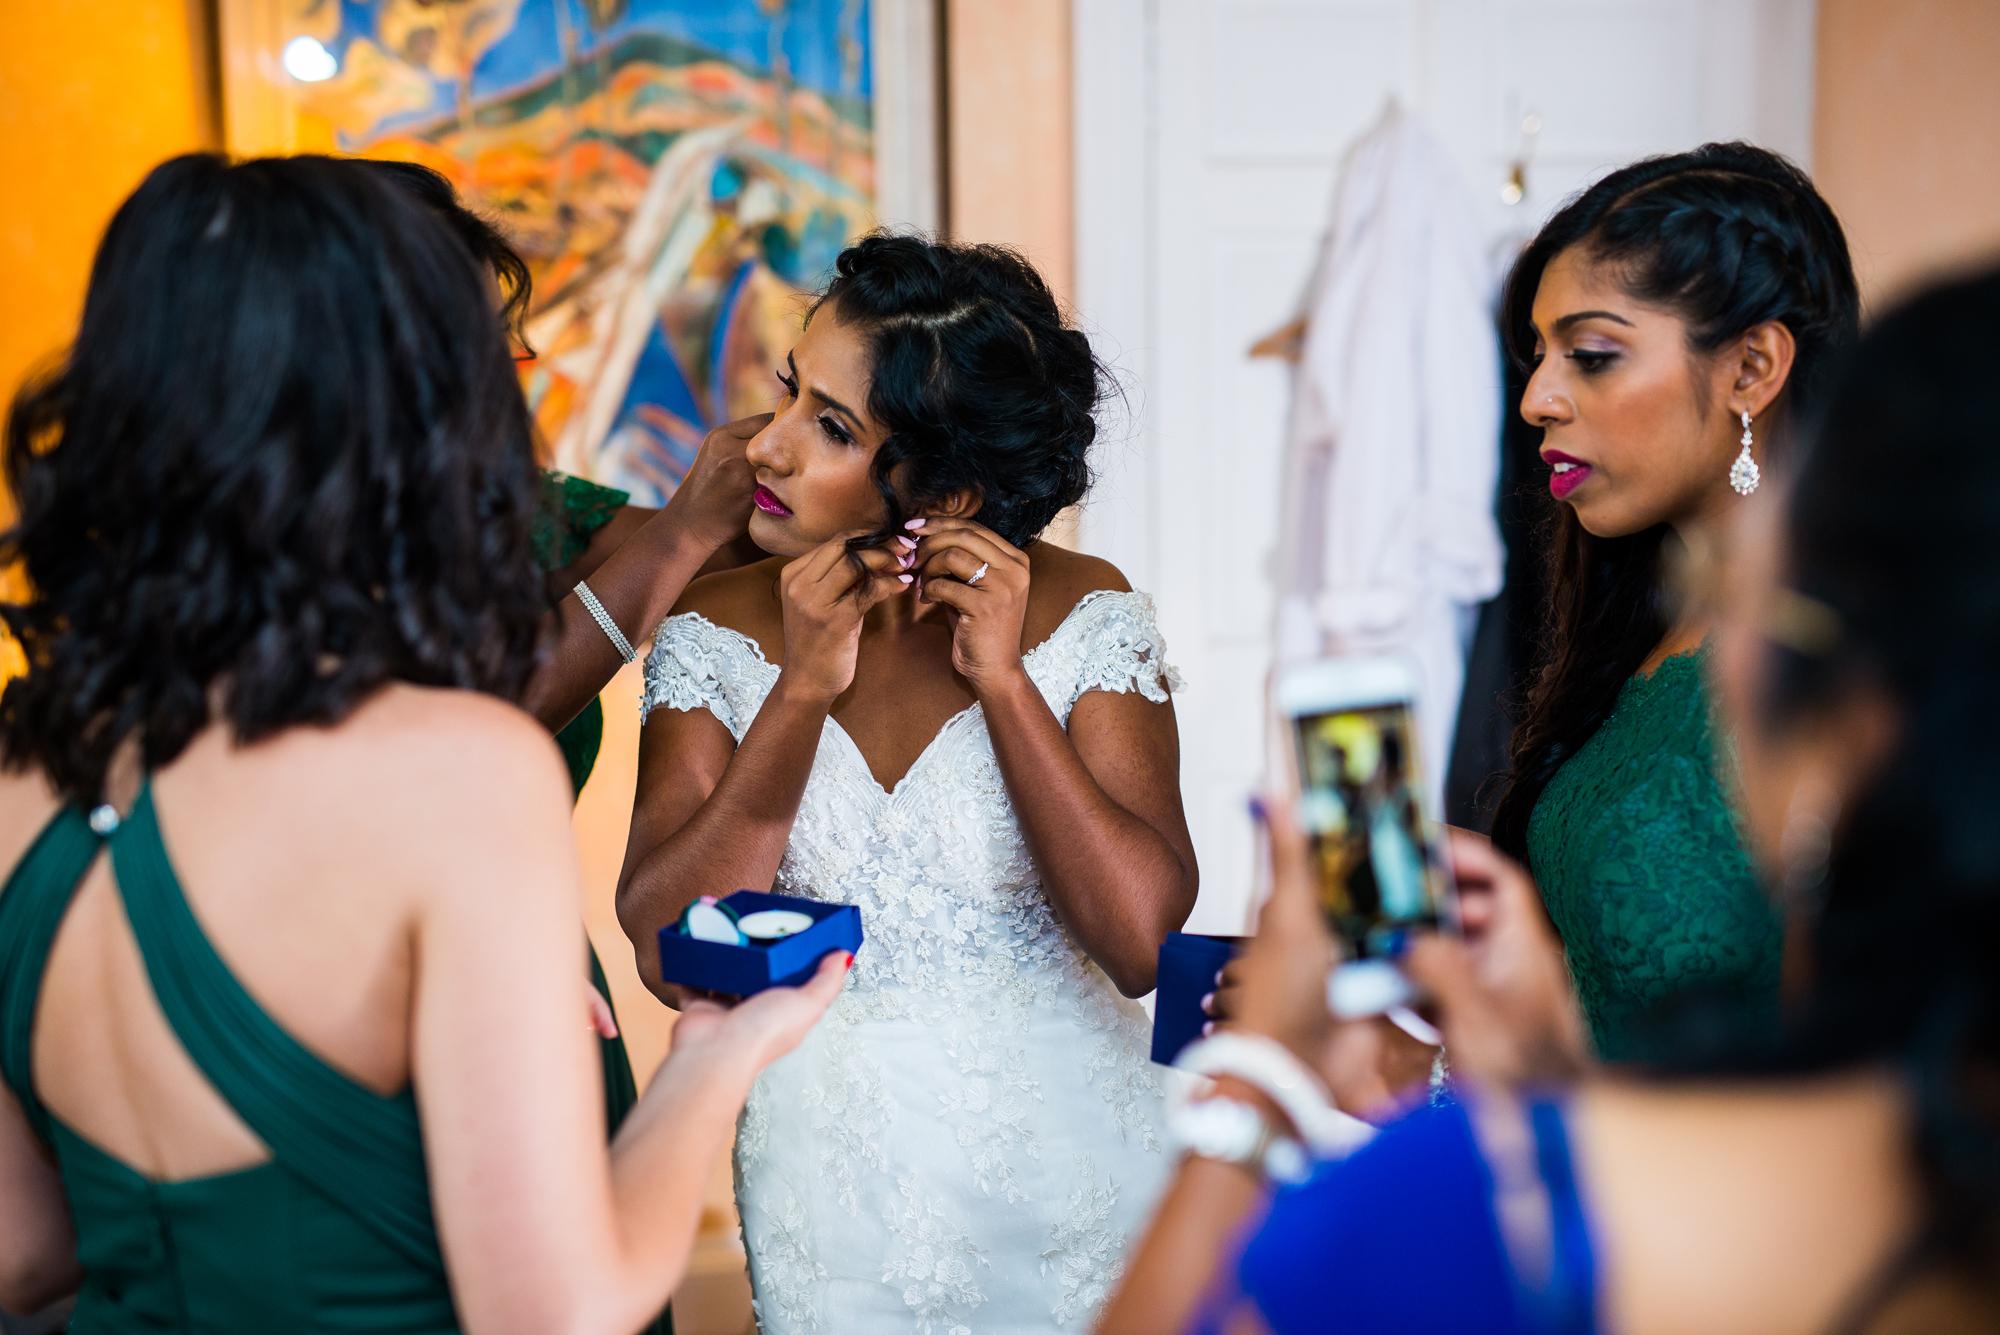 Kev and Shrabani wedding photos (37 of 350).jpg